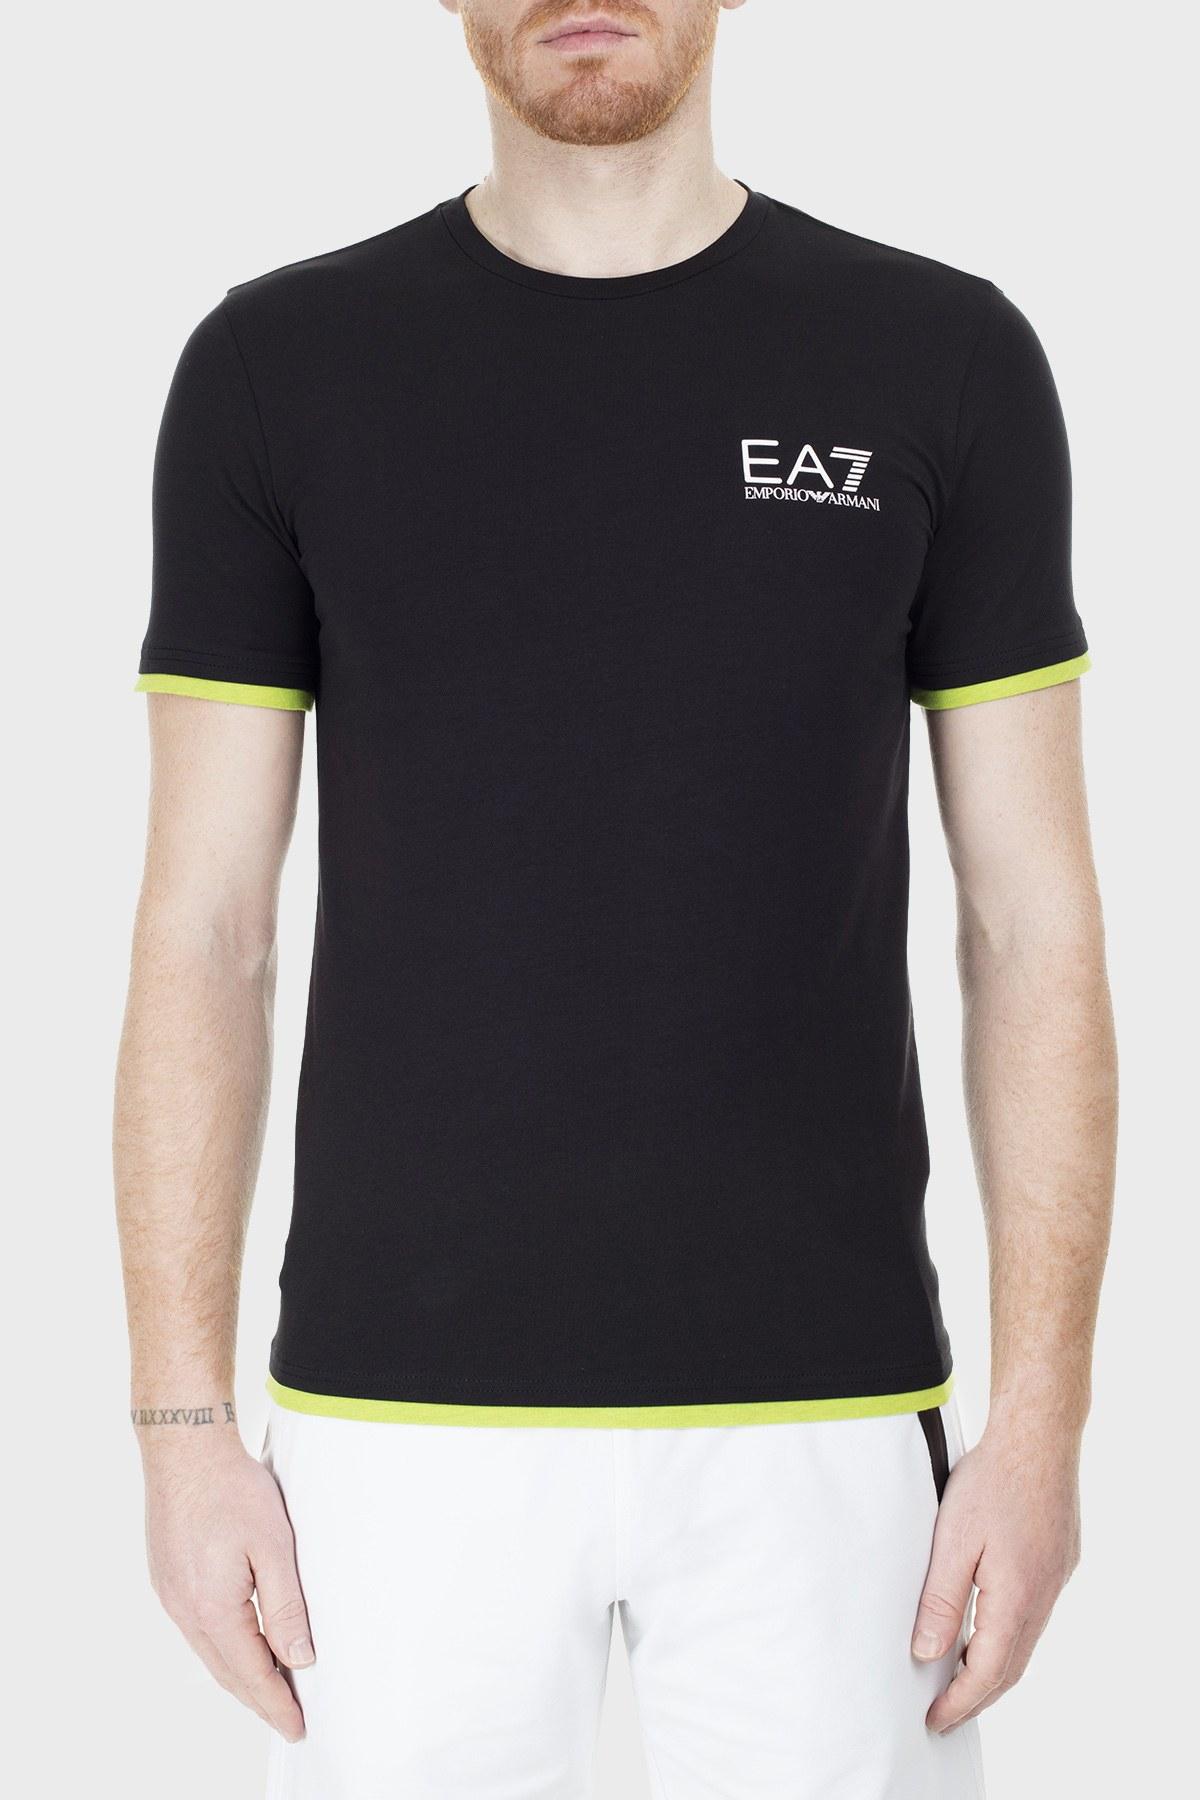 EA7 Regular Fit Erkek T Shirt S 6GPT02 PJ03Z 1200 SİYAH